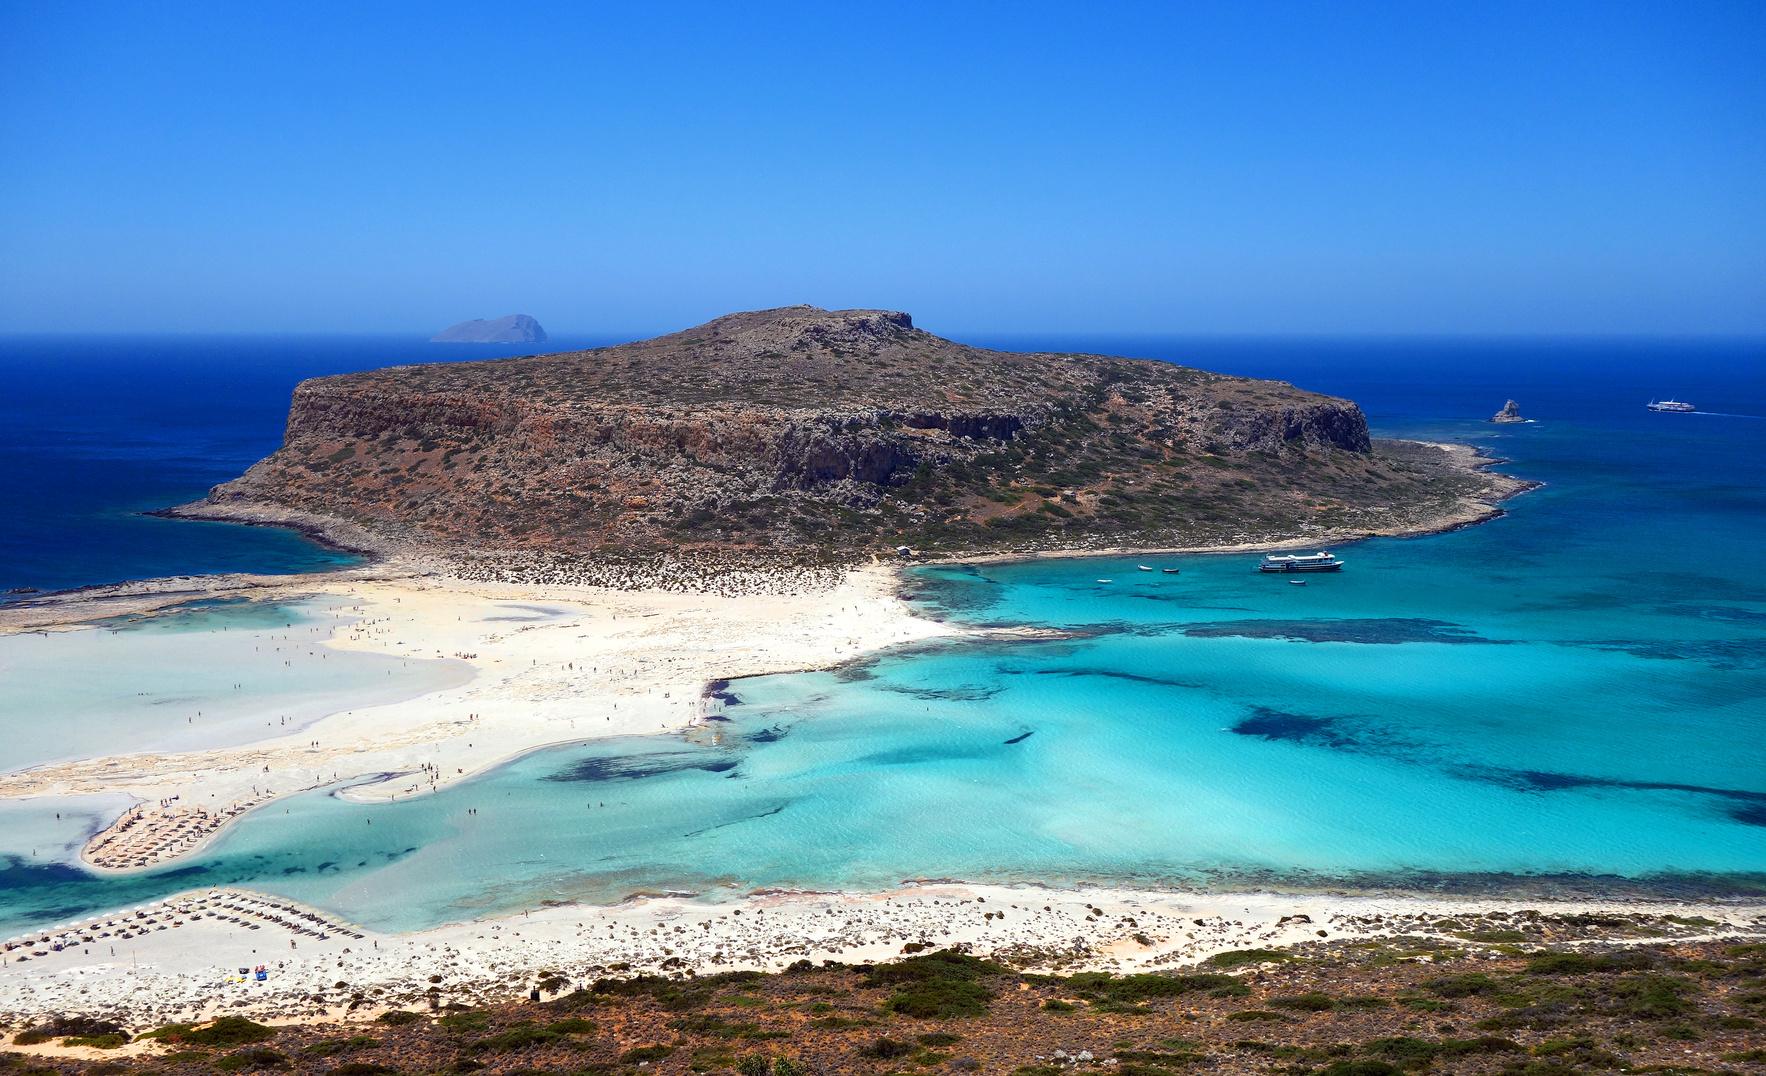 Crete Island Greece  city photos gallery : Chania Crete Greece: Compare Chania to Greek Islands | YourGreekIsland